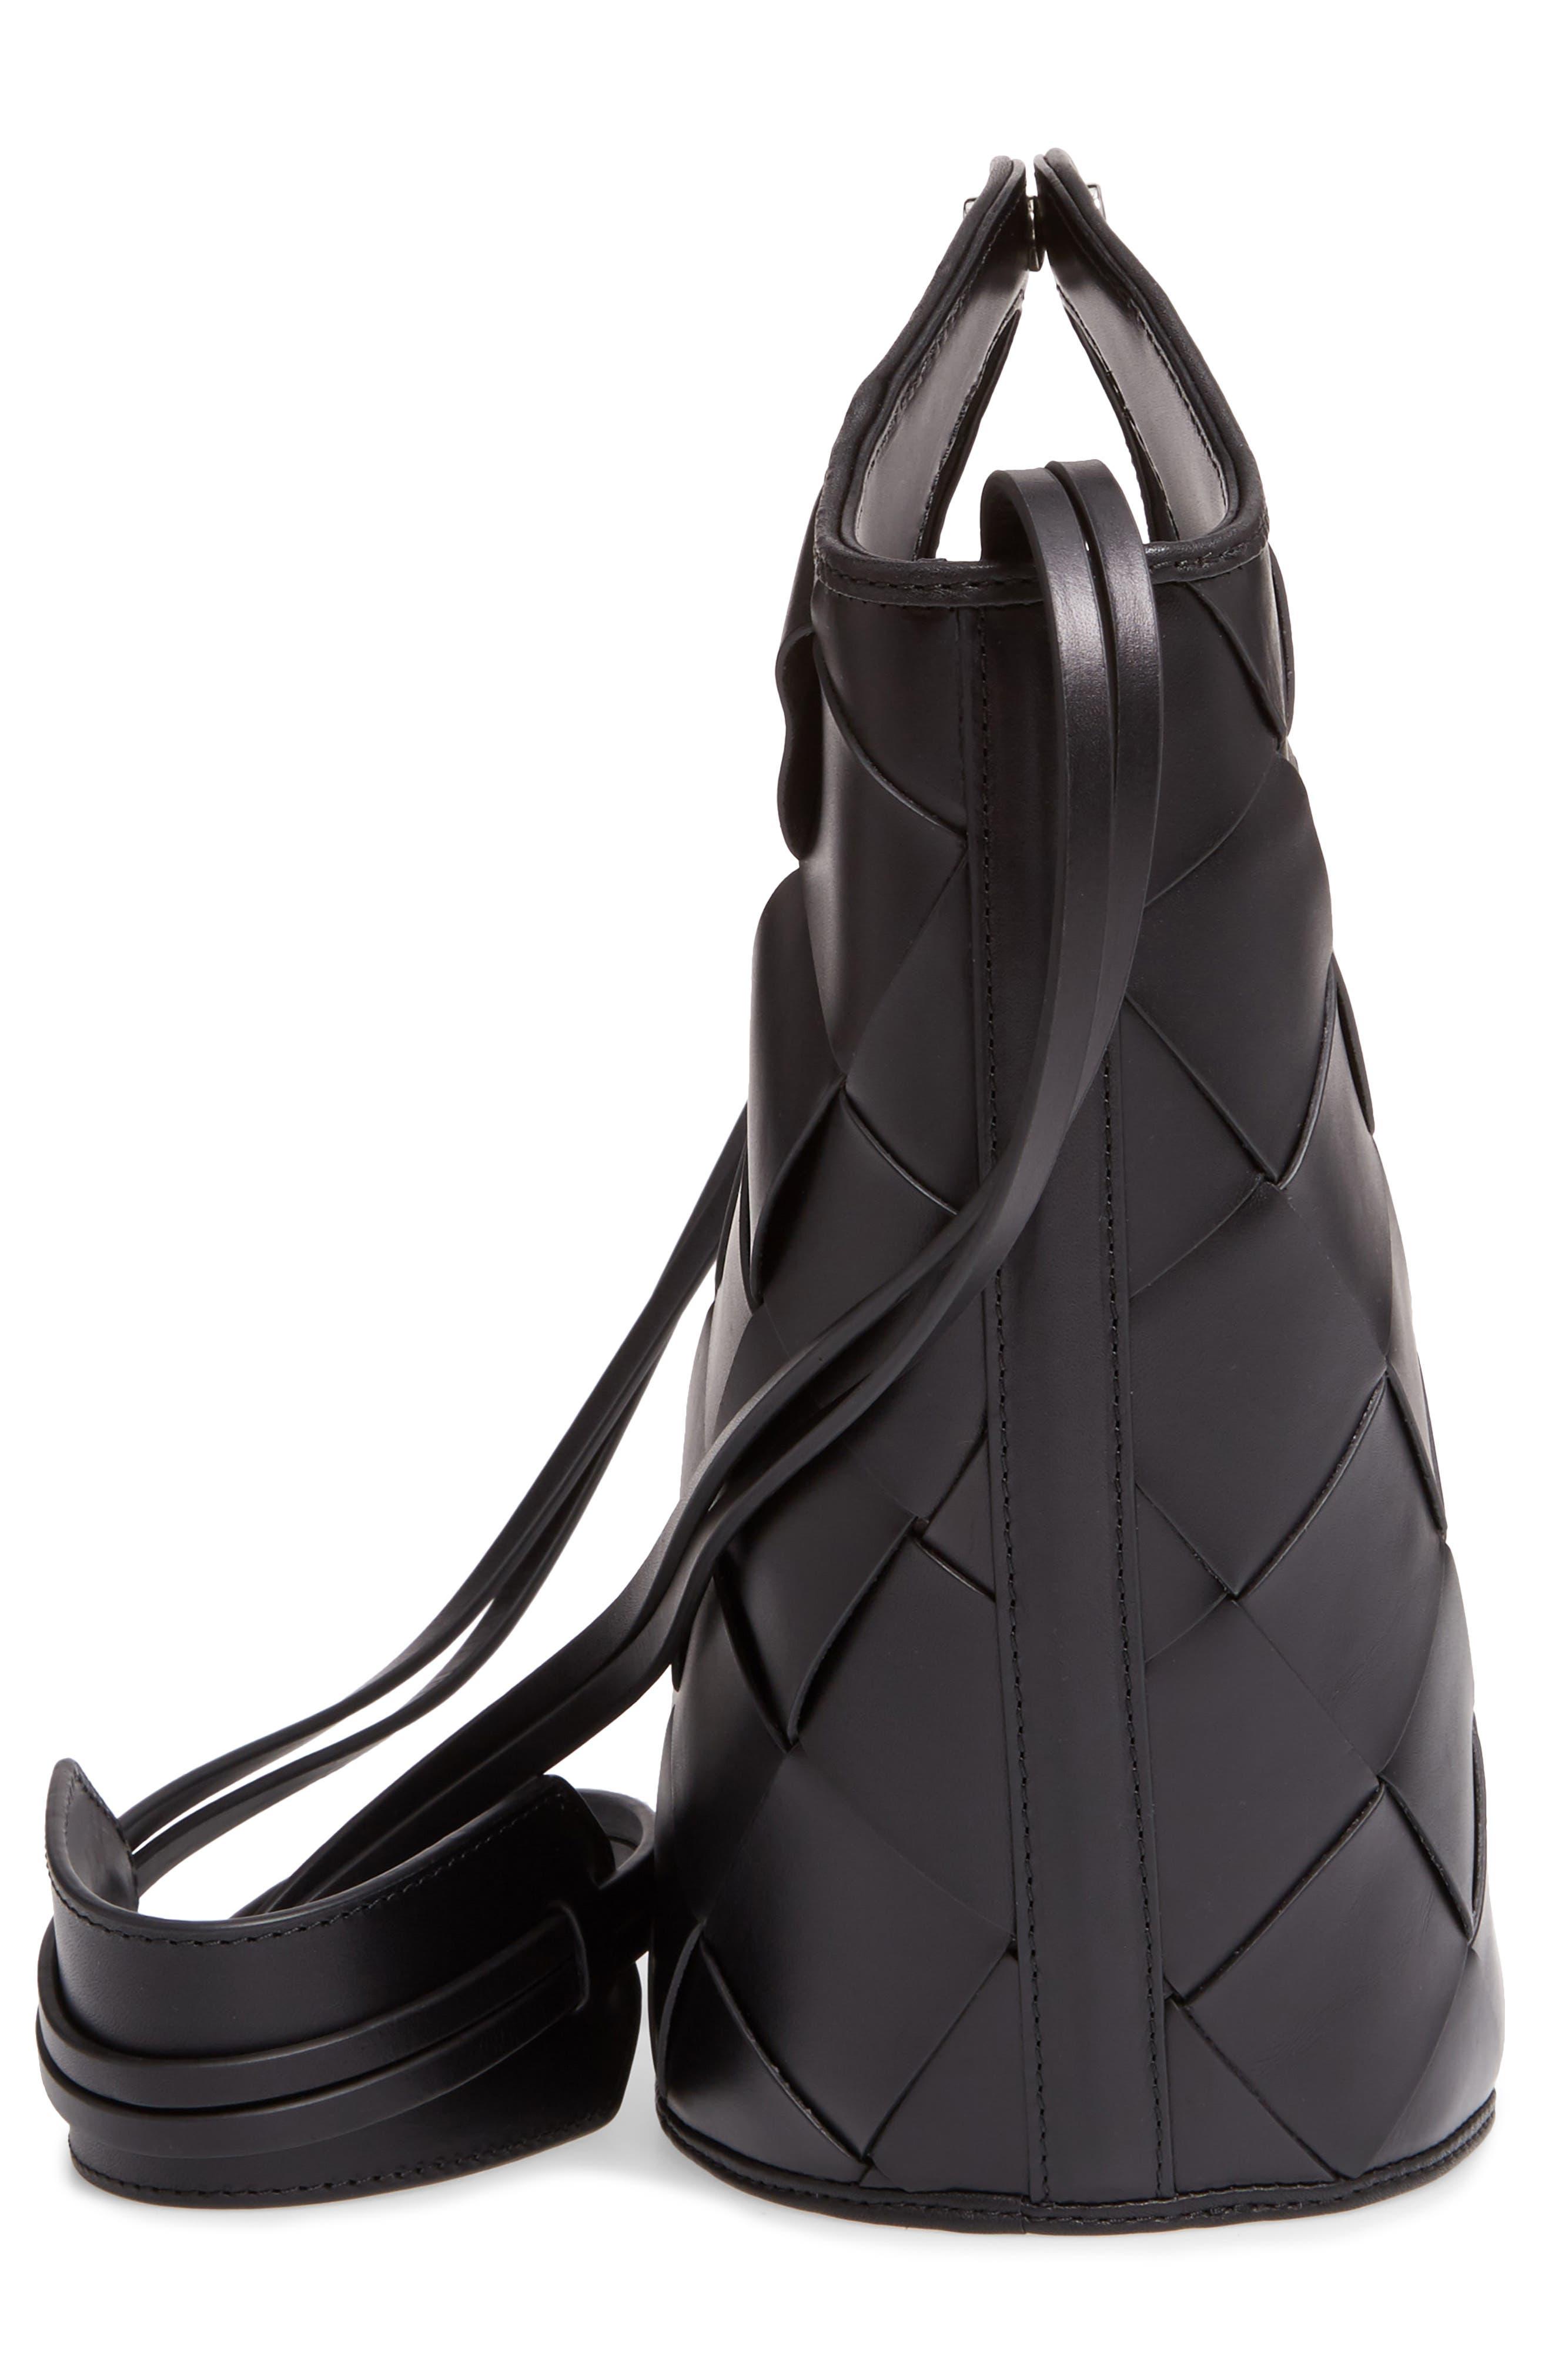 Small Market Woven Leather Crossbody Shopper,                             Alternate thumbnail 5, color,                             001